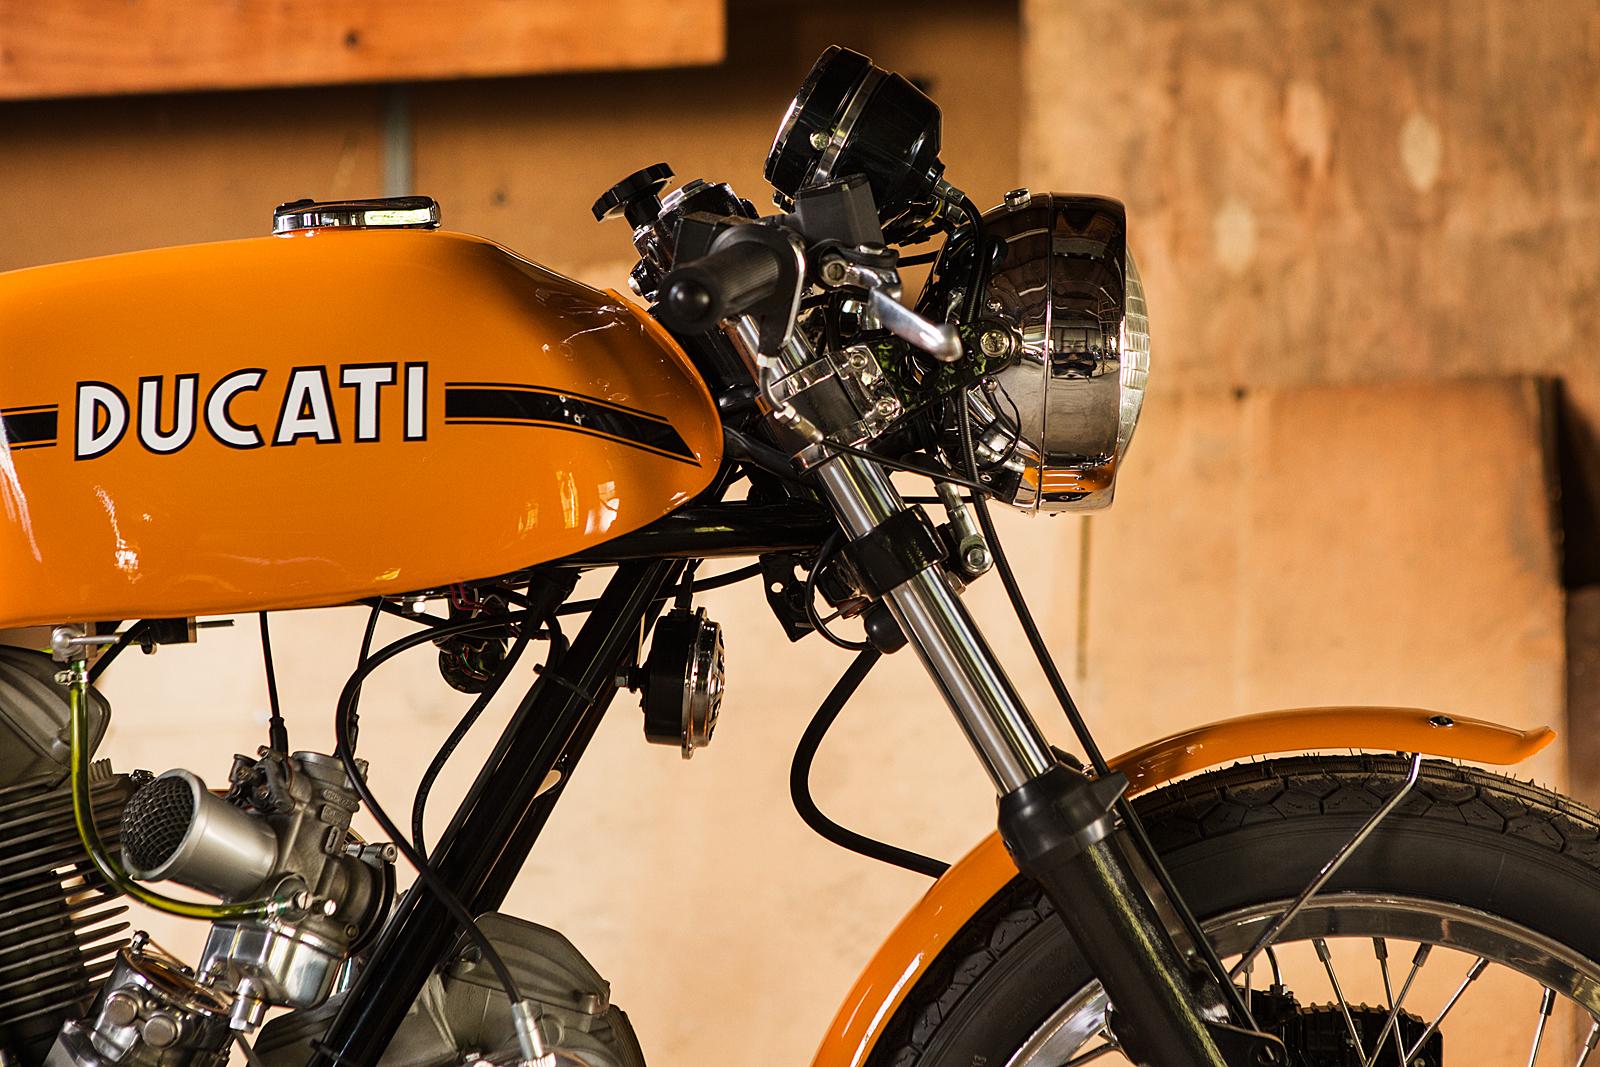 1974 Ducati 750S Sport forks tank